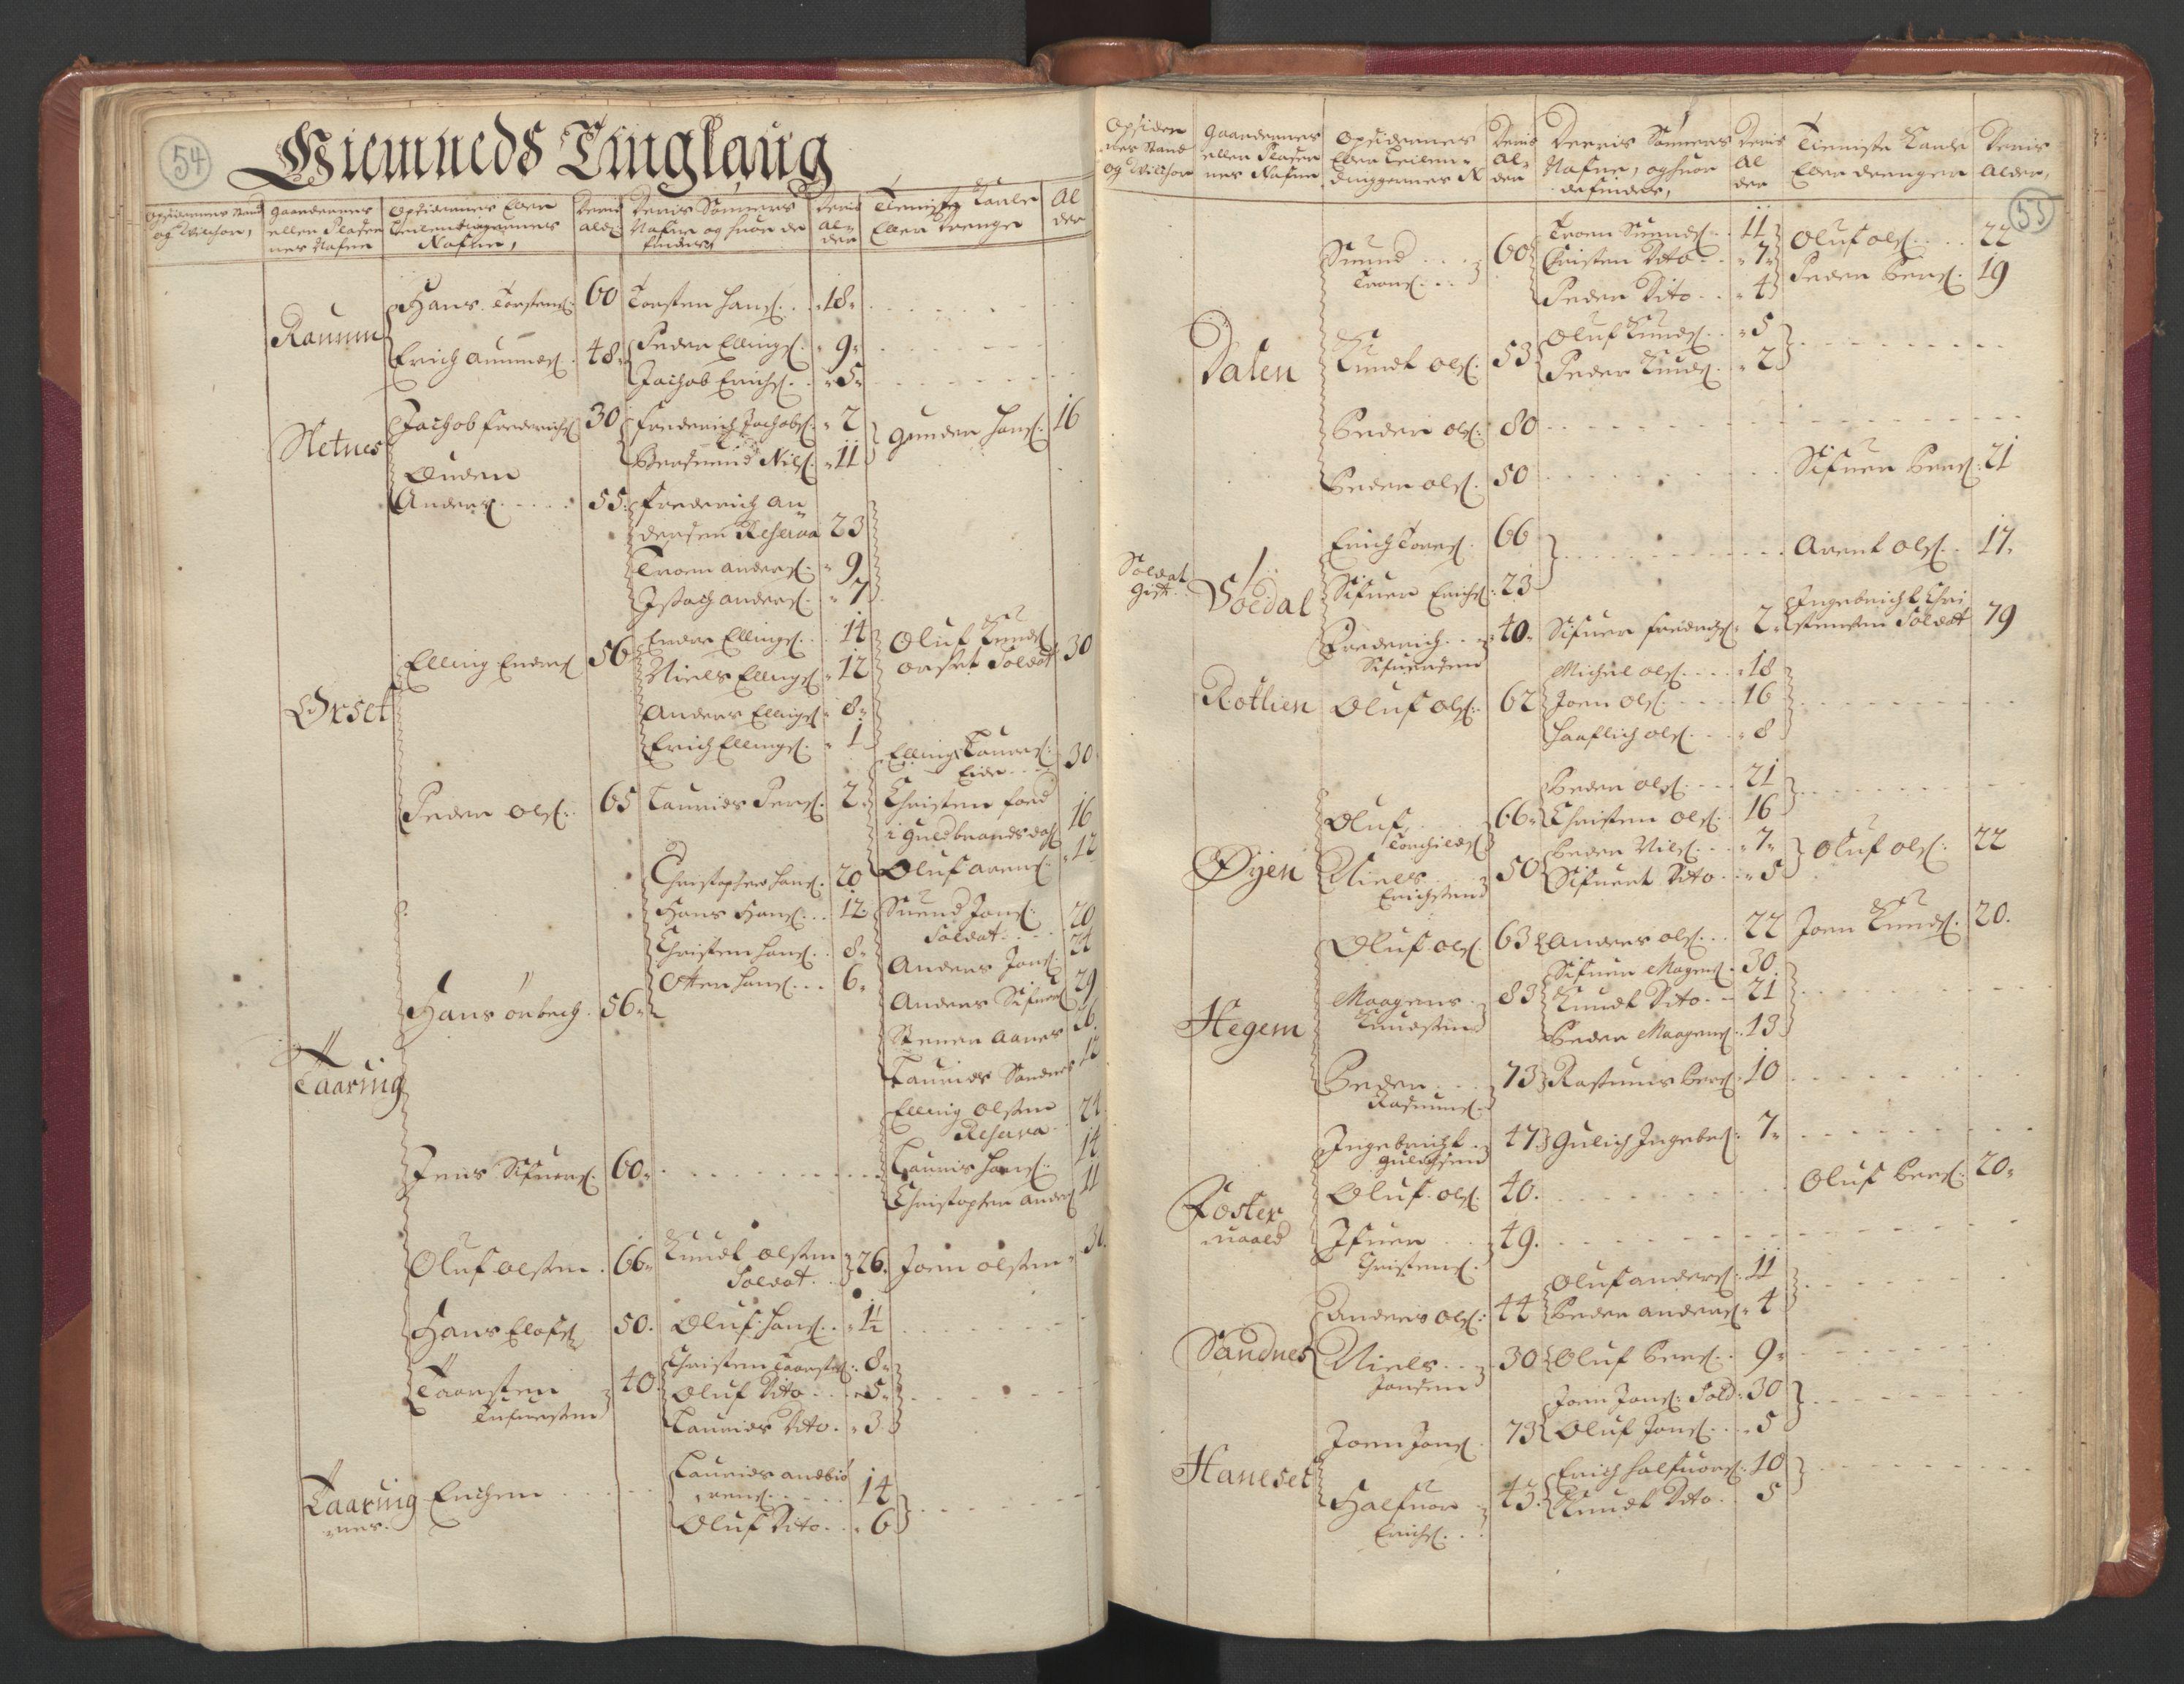 RA, Manntallet 1701, nr. 11: Nordmøre fogderi og Romsdal fogderi, 1701, s. 54-55